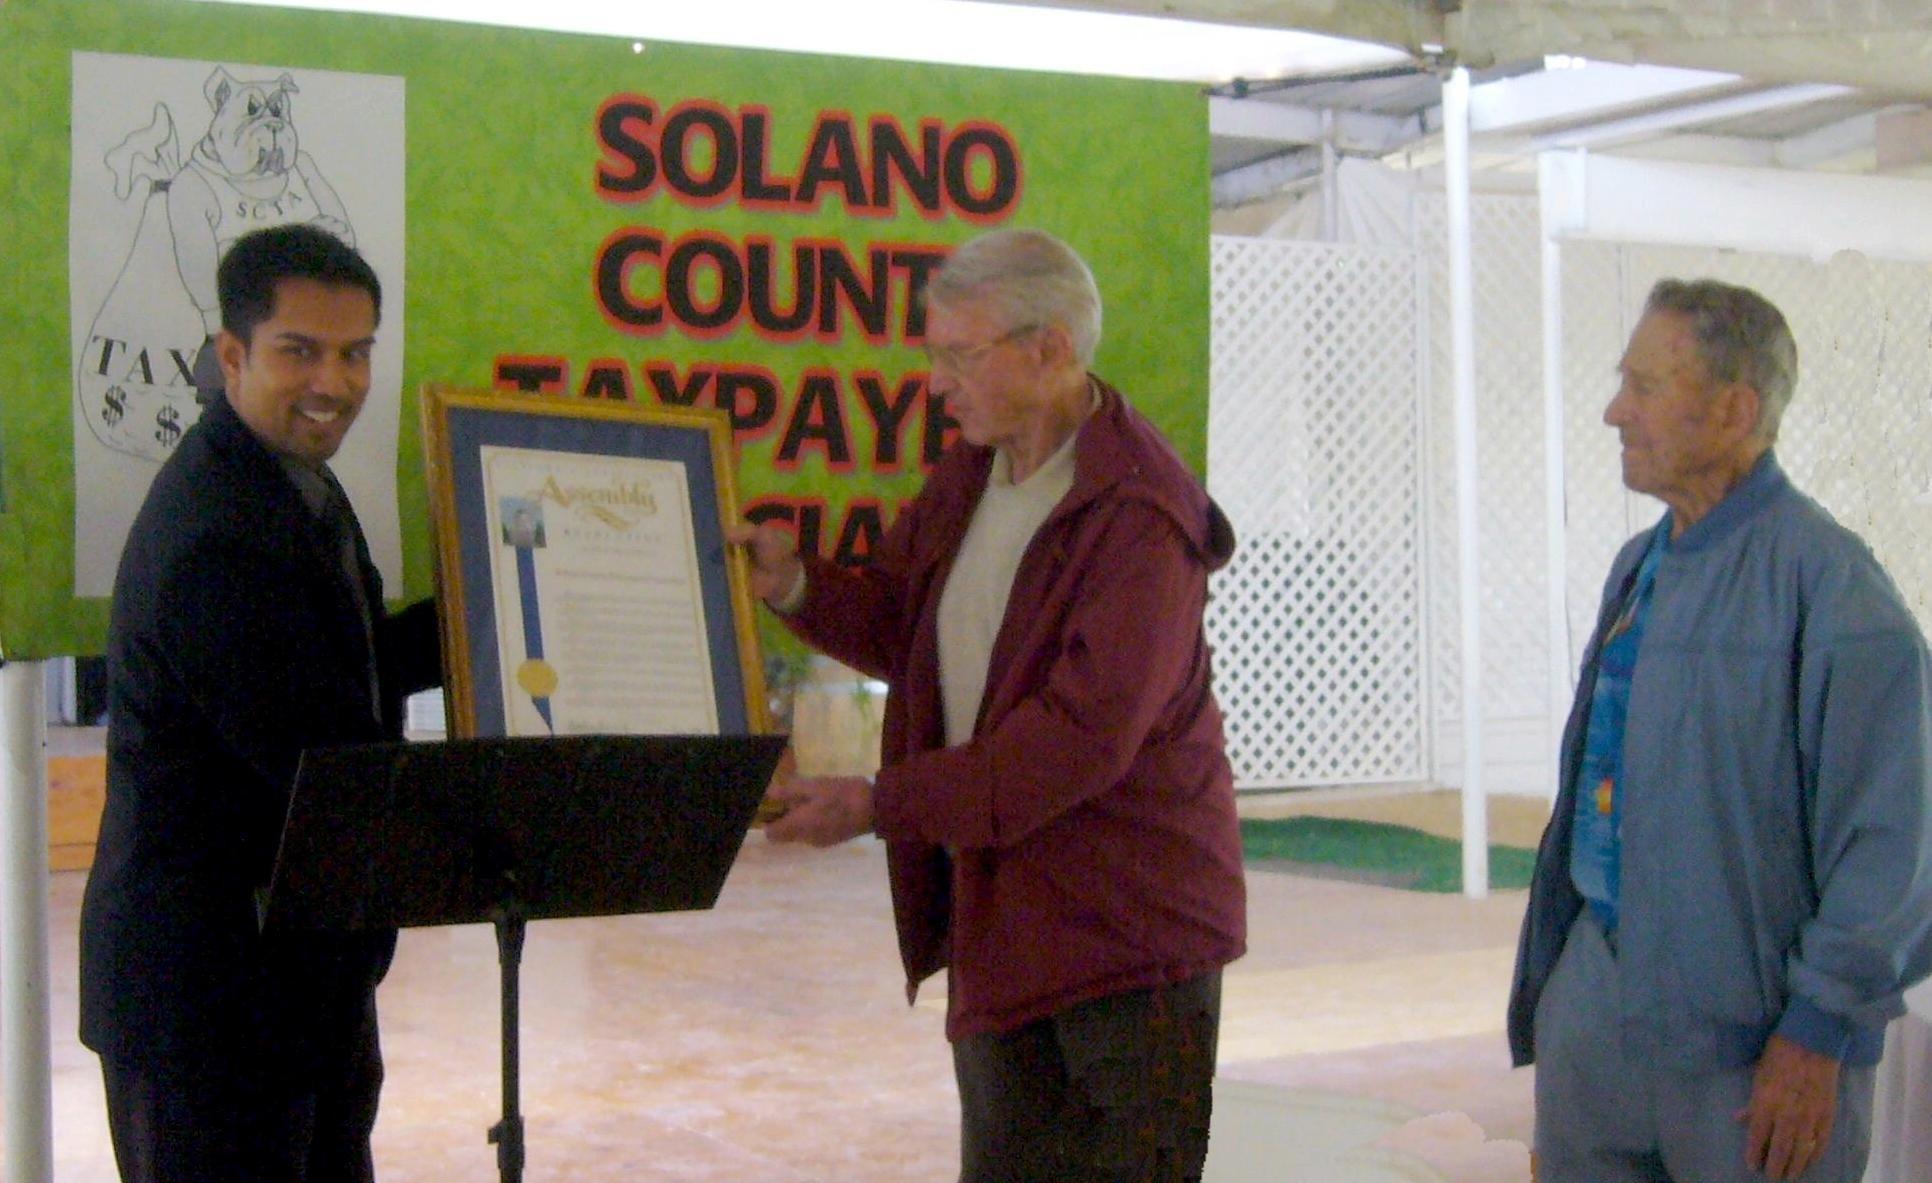 Presentation of the California Legislature Resolution. October 17, 2010